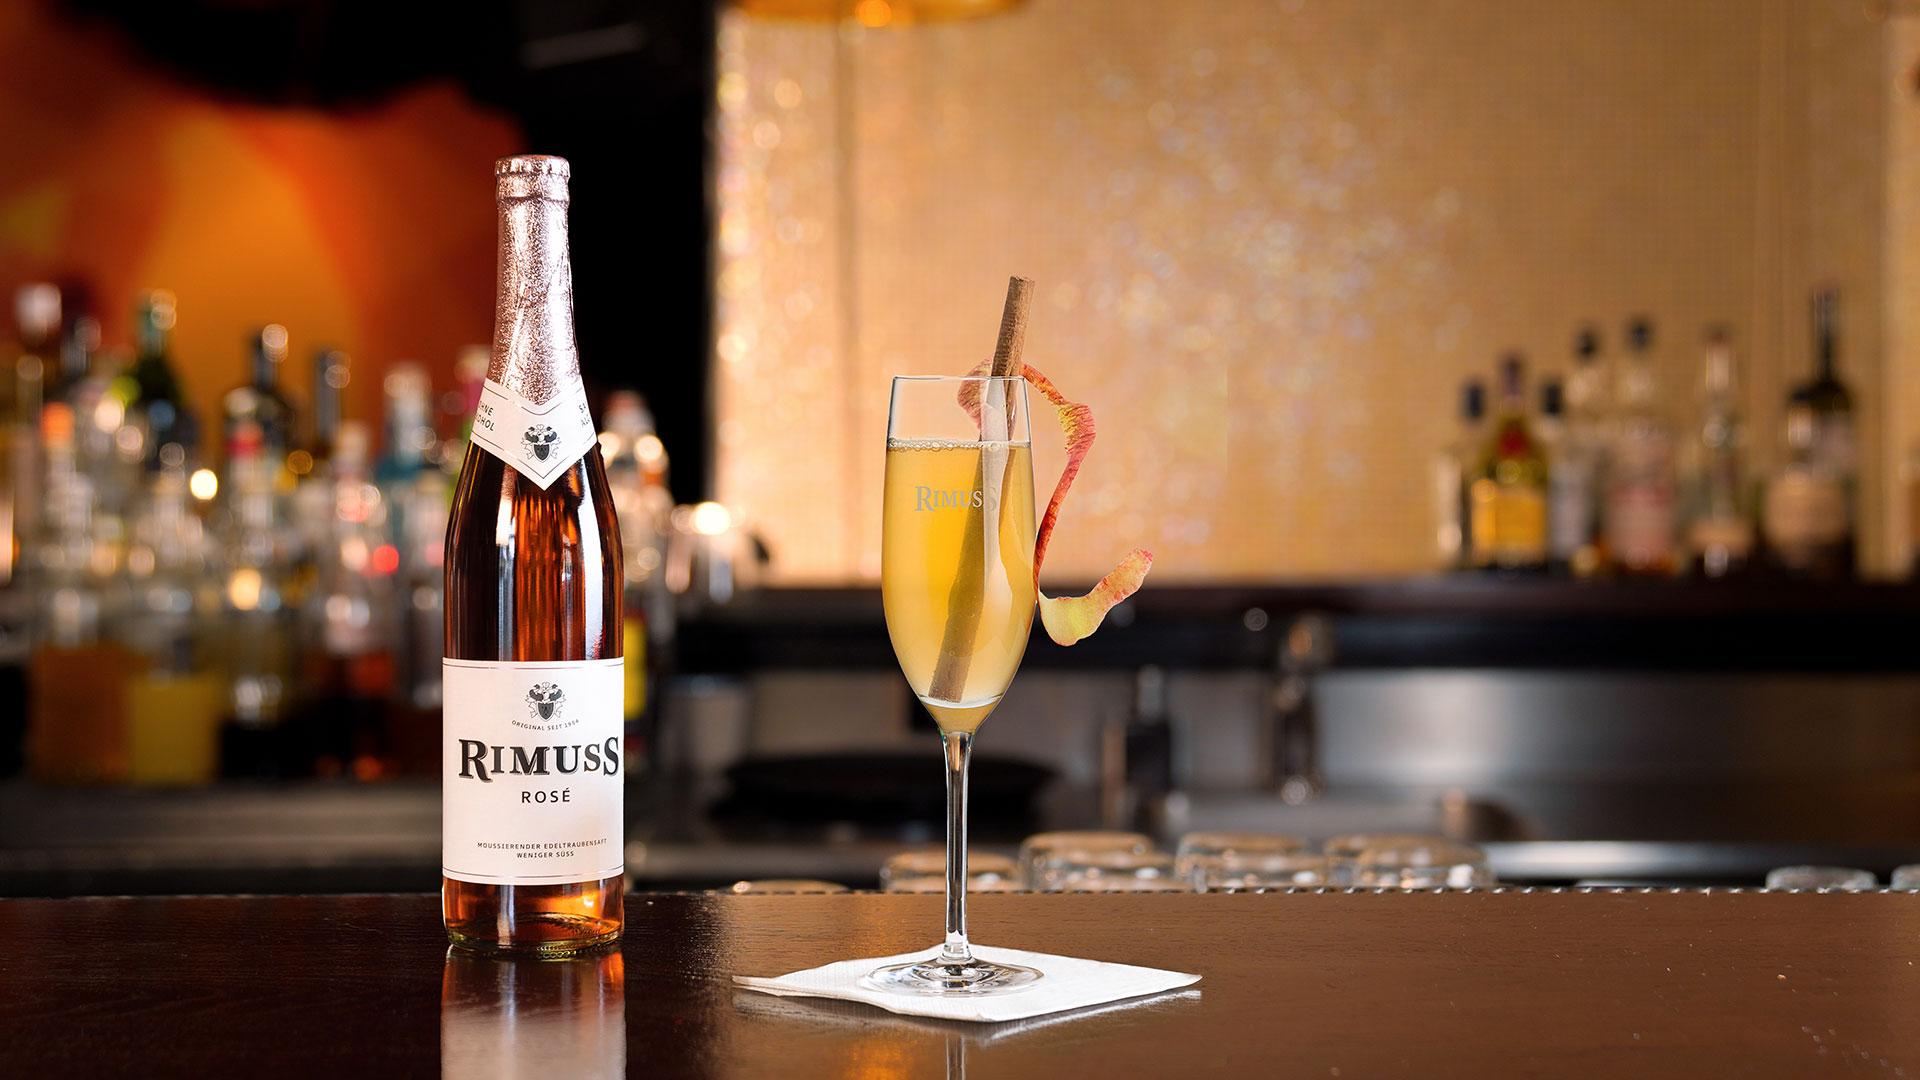 Rimuss Apfelpunsch ohne alkohol